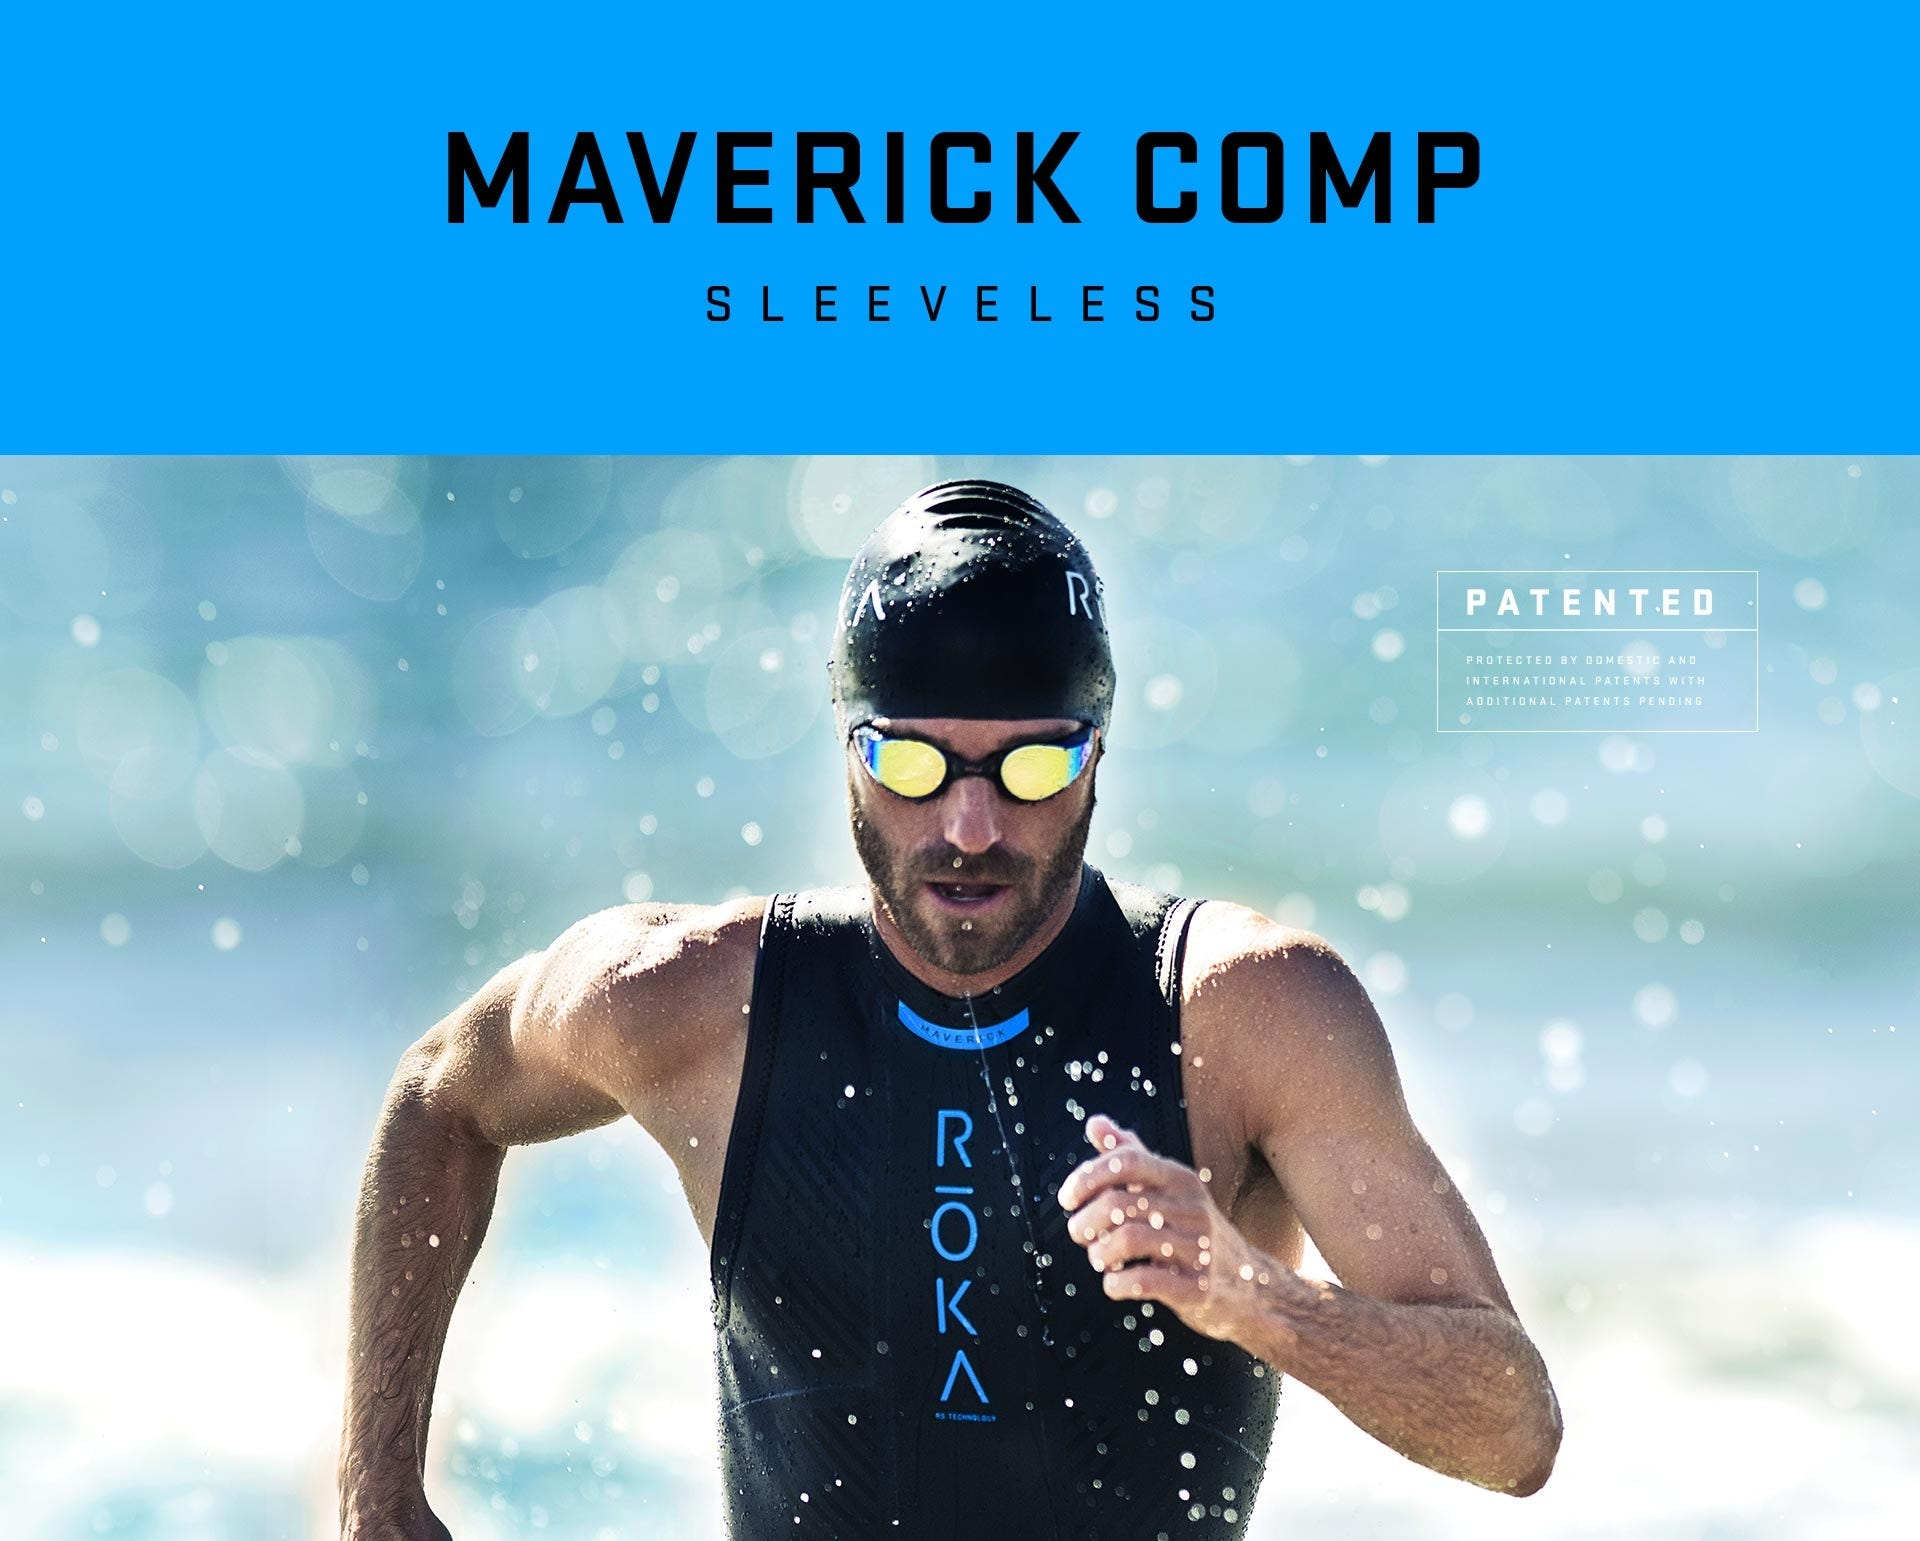 e96ae23d72 IRONMAN ROKA Men s Maverick Comp II Sleeveless Wetsuit. Hover to zoom.  Details